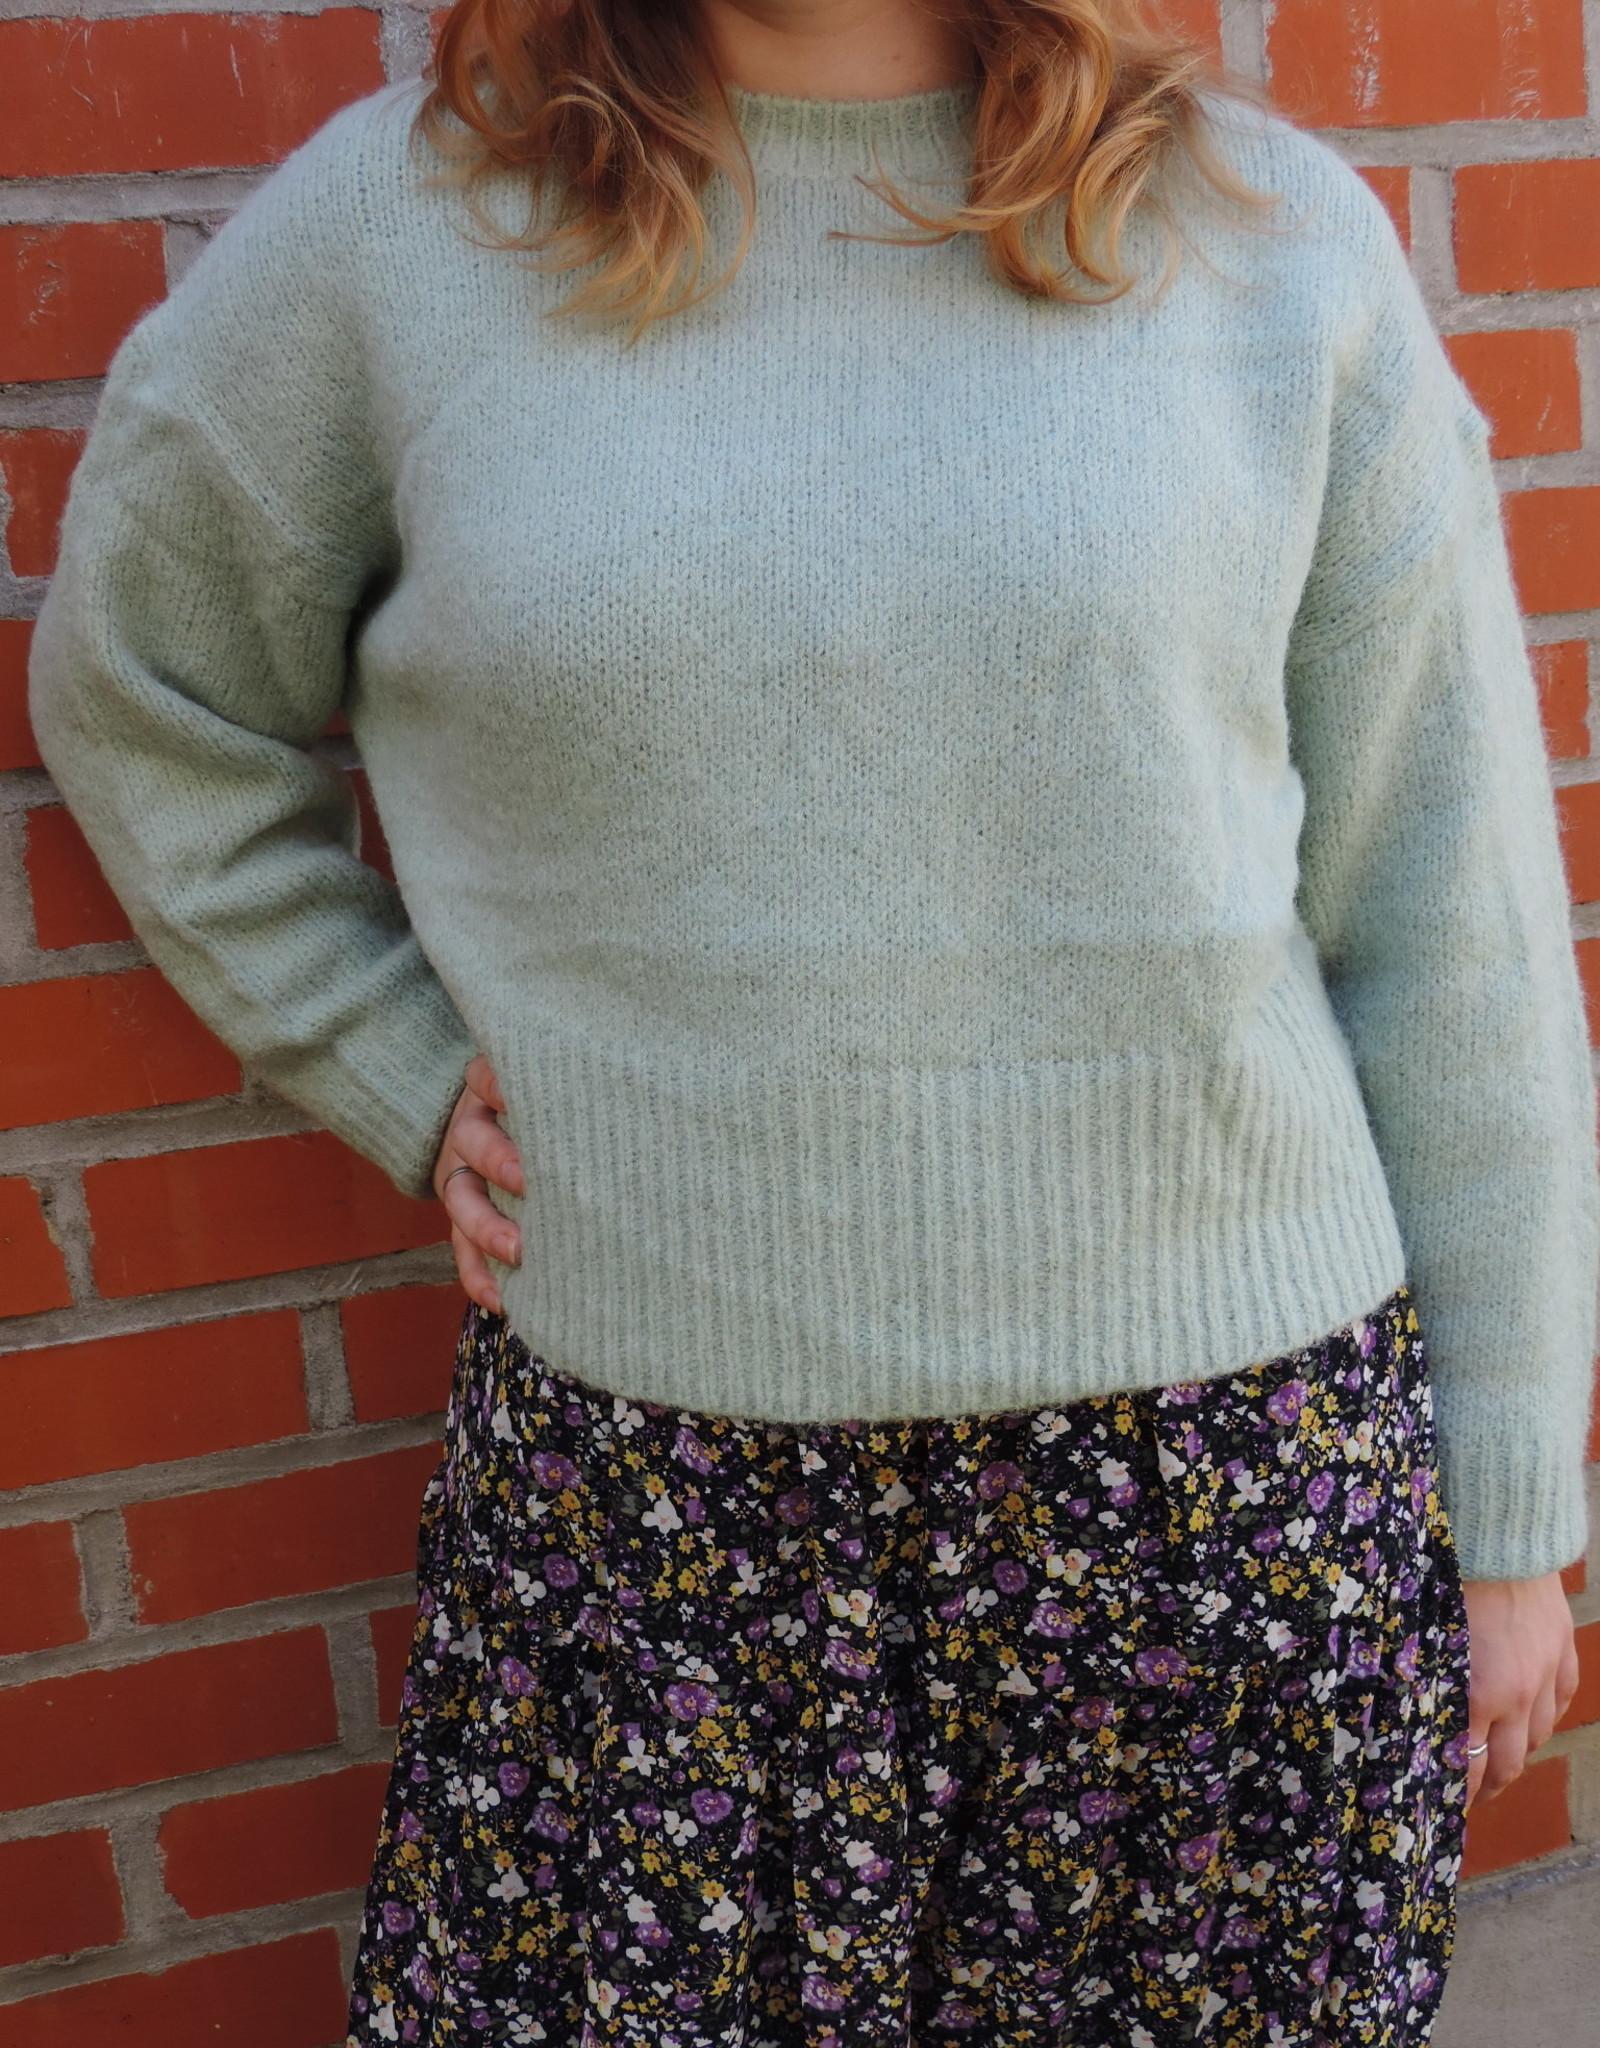 Polichino knit opaline